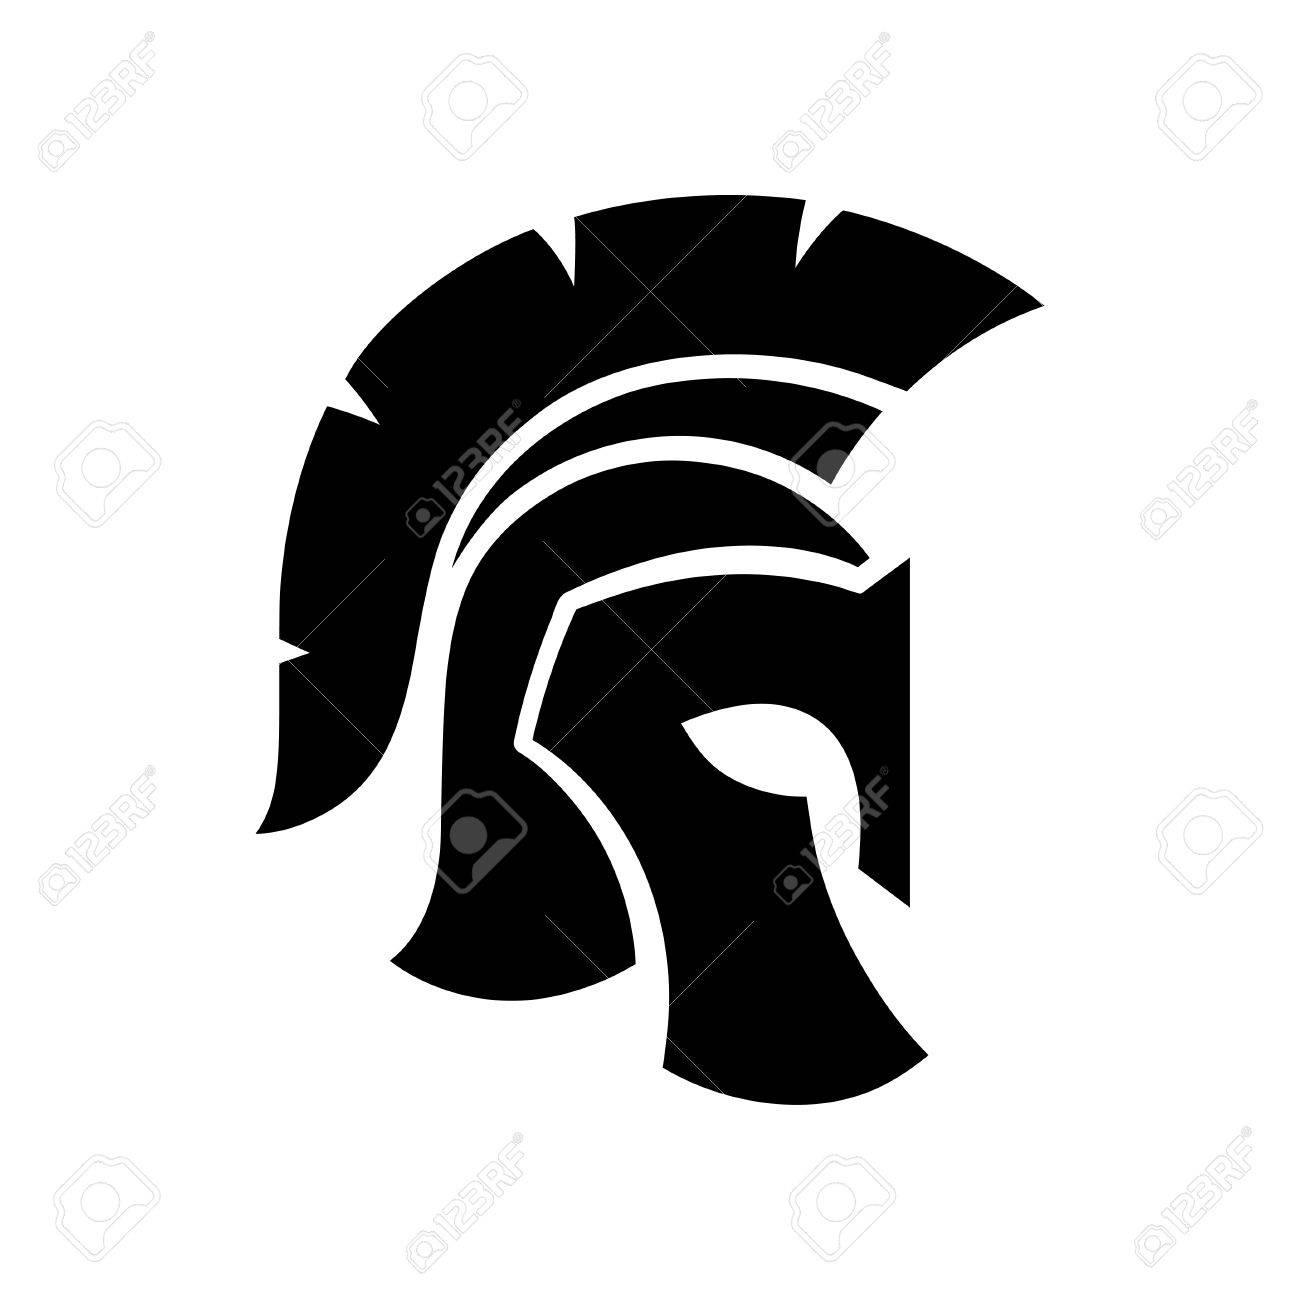 Gladiator helmet silhouette icon.